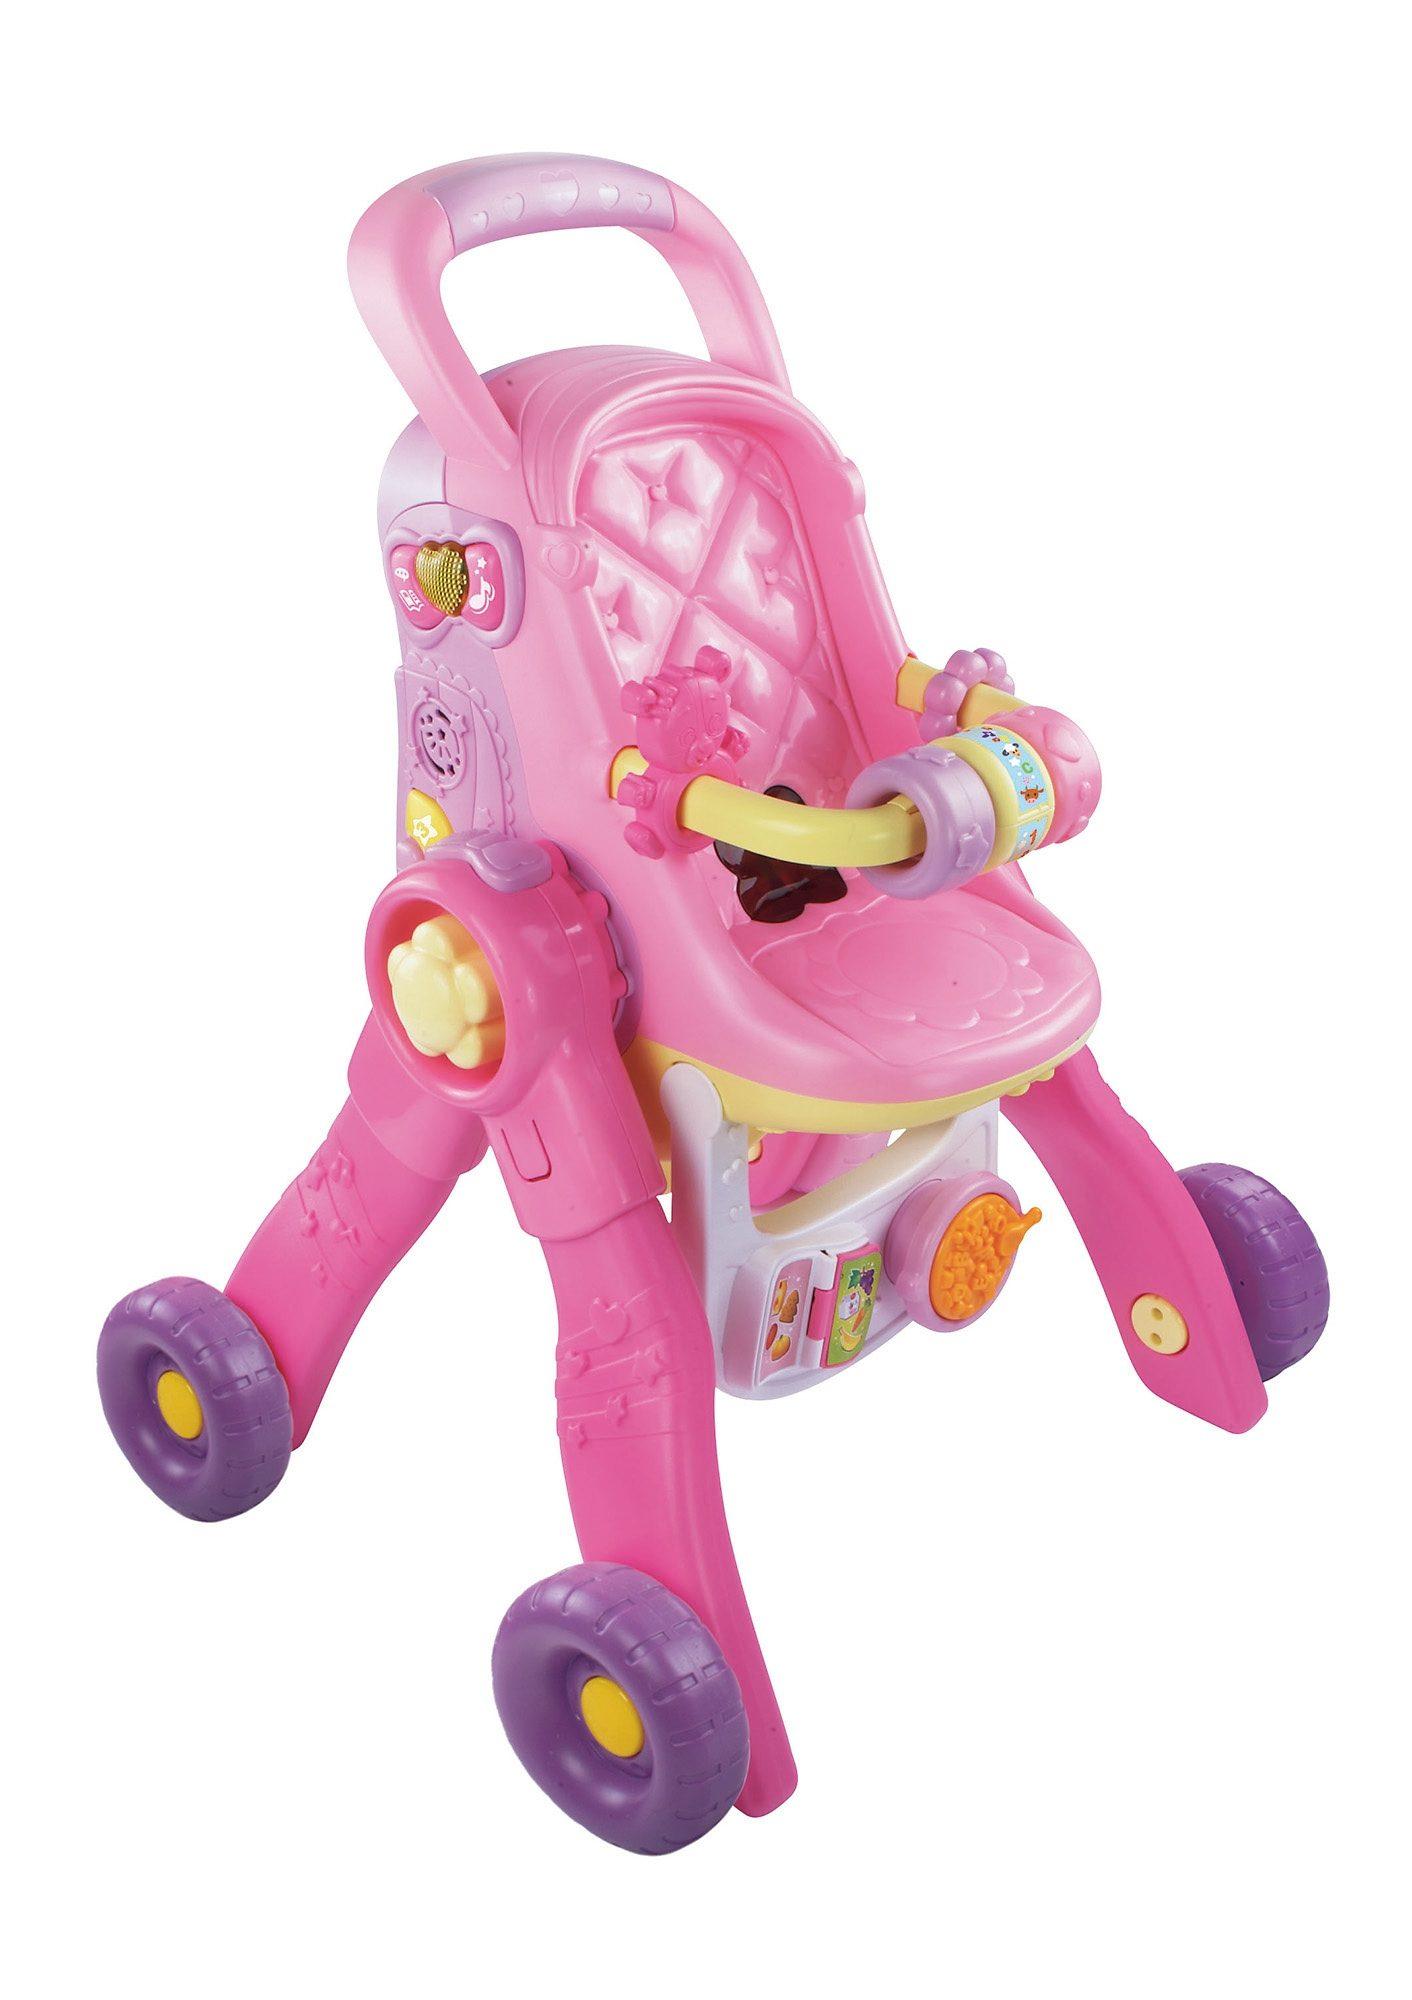 VTech Puppenwagen, »Little Love - 3-in-1 Magischer Puppenwagen«